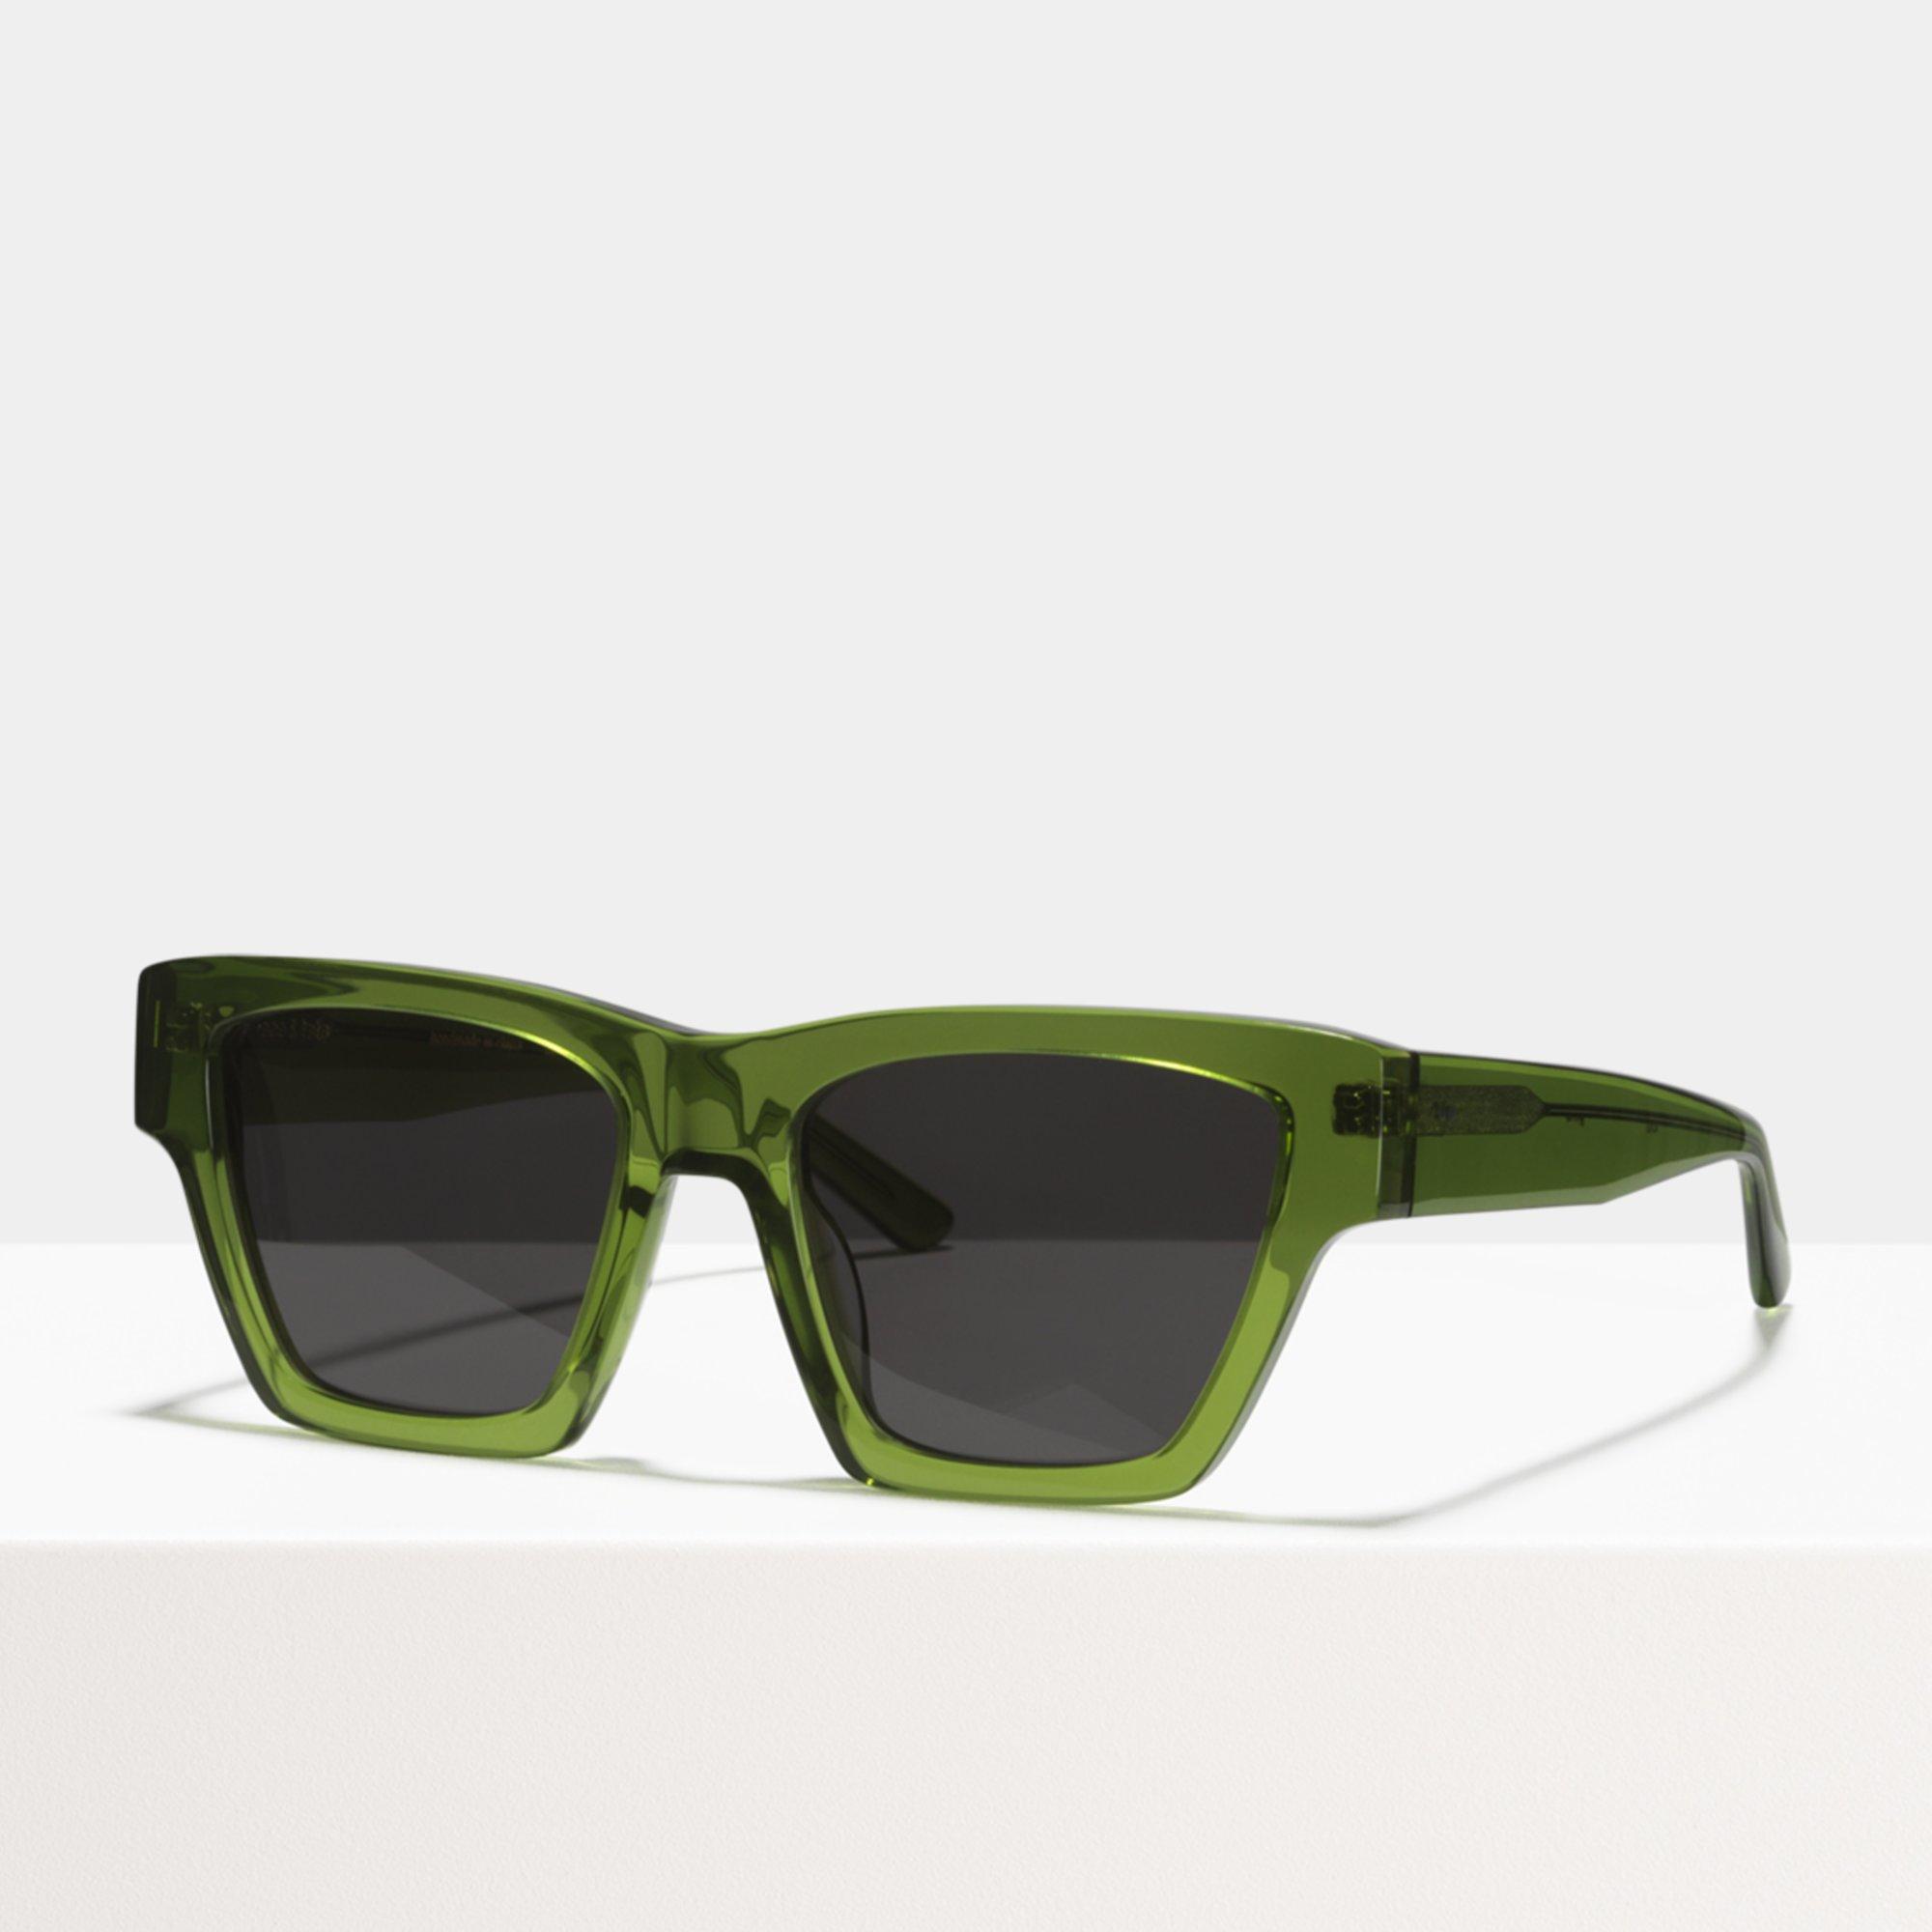 Ace & Tate Sunglasses   quadratisch Acetat in Grün